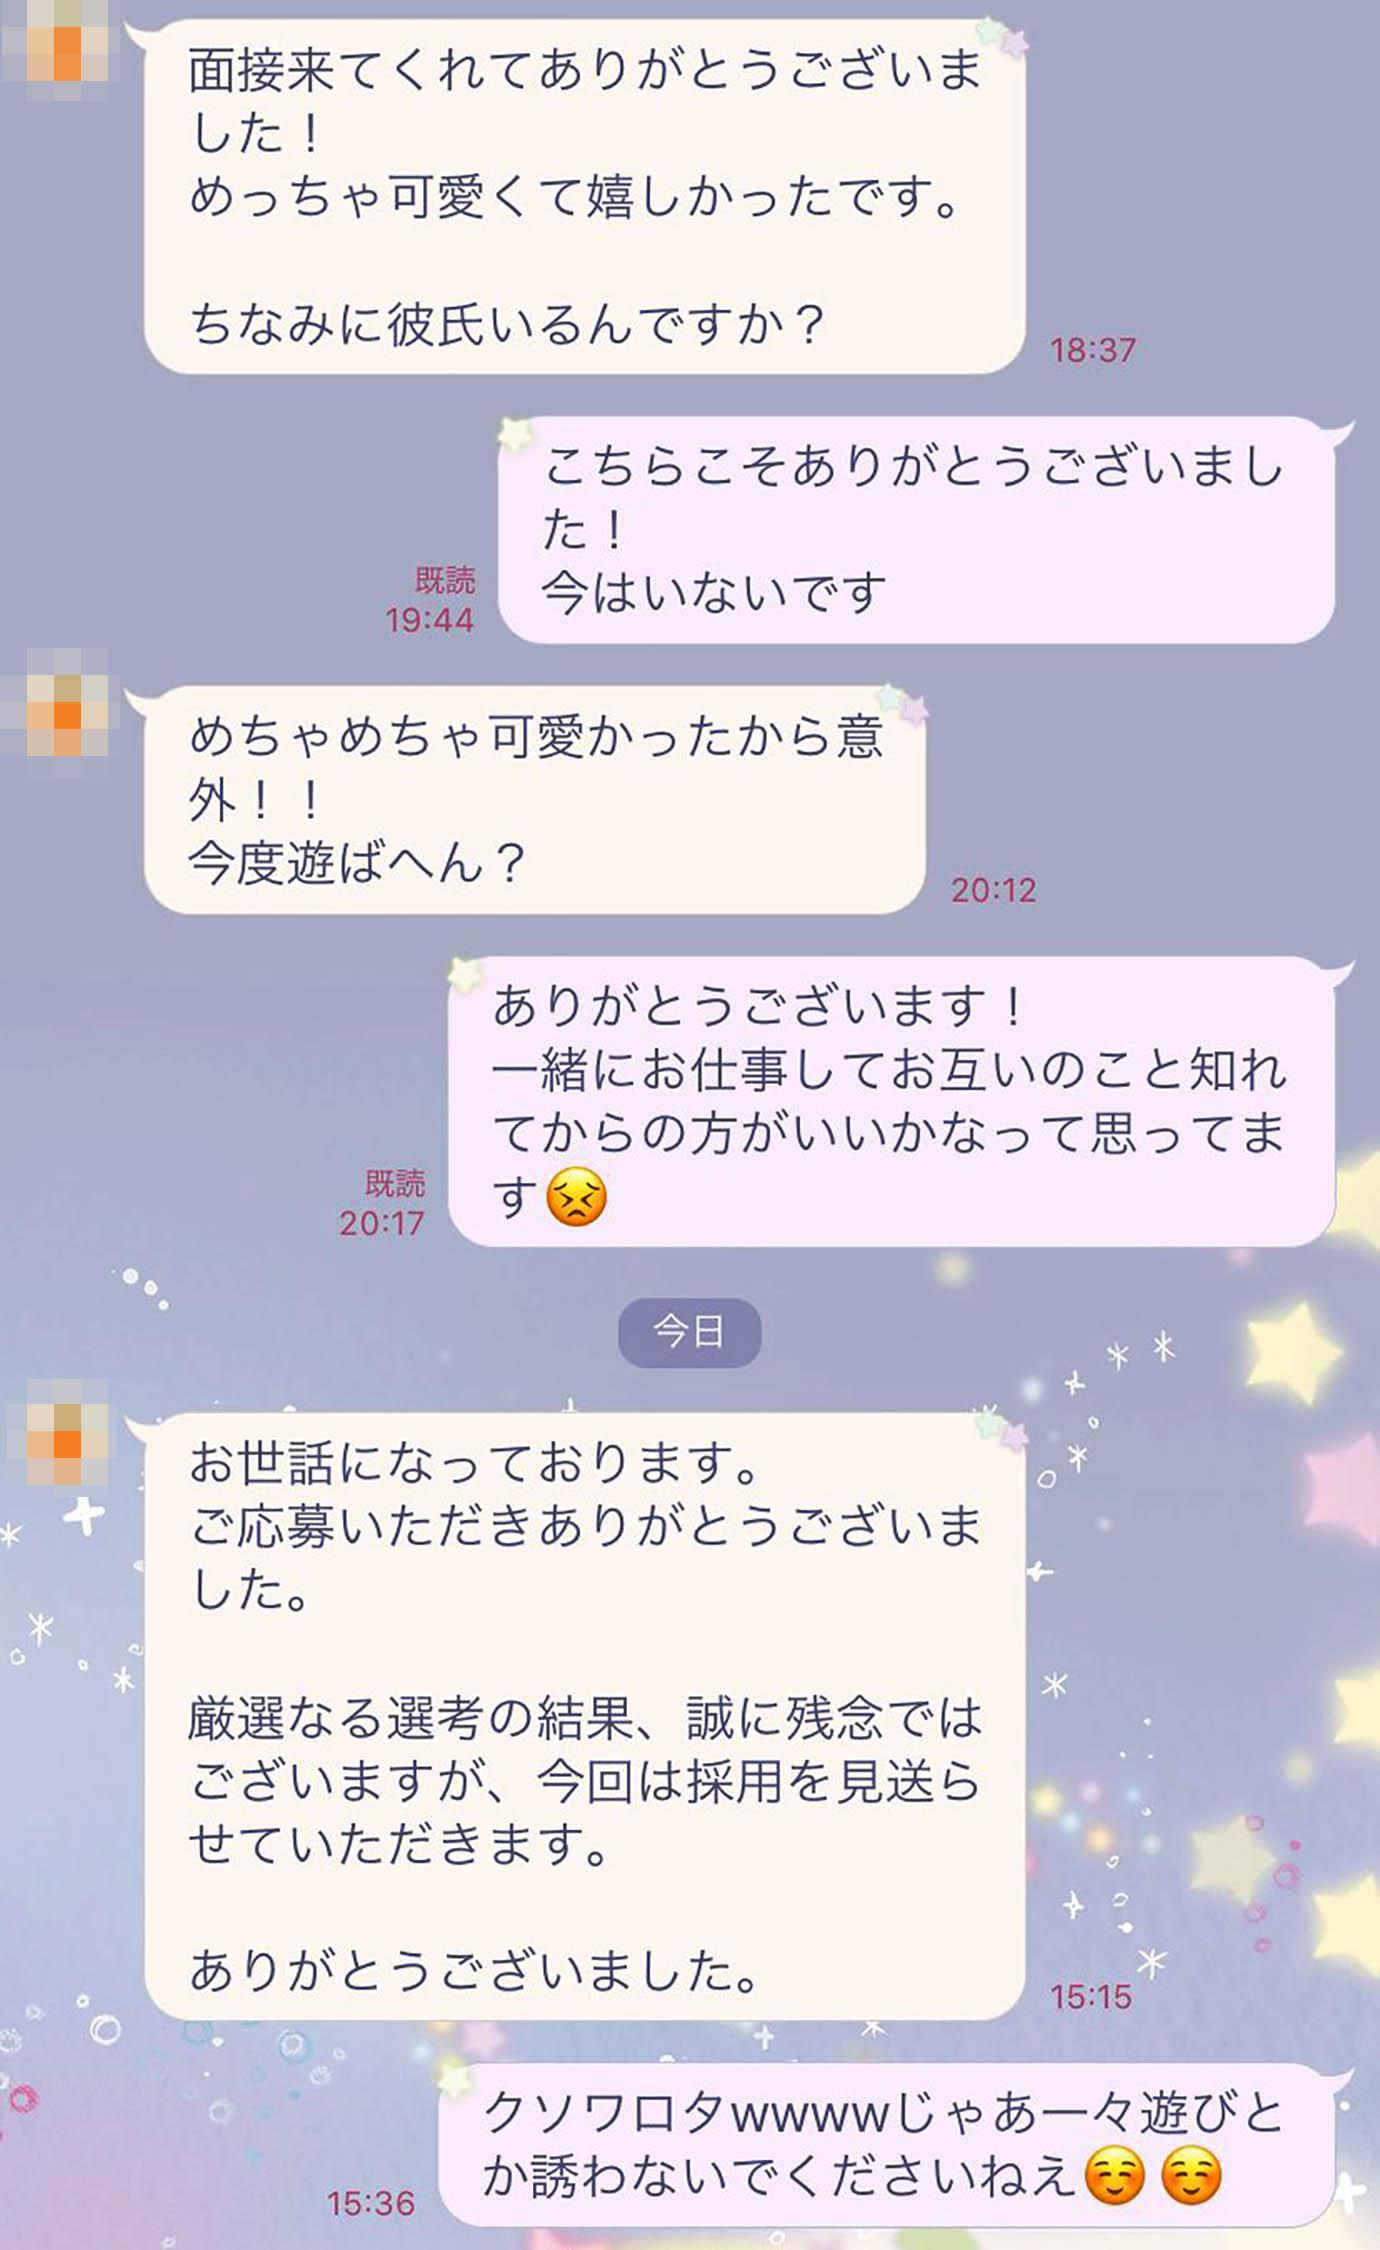 line-image1